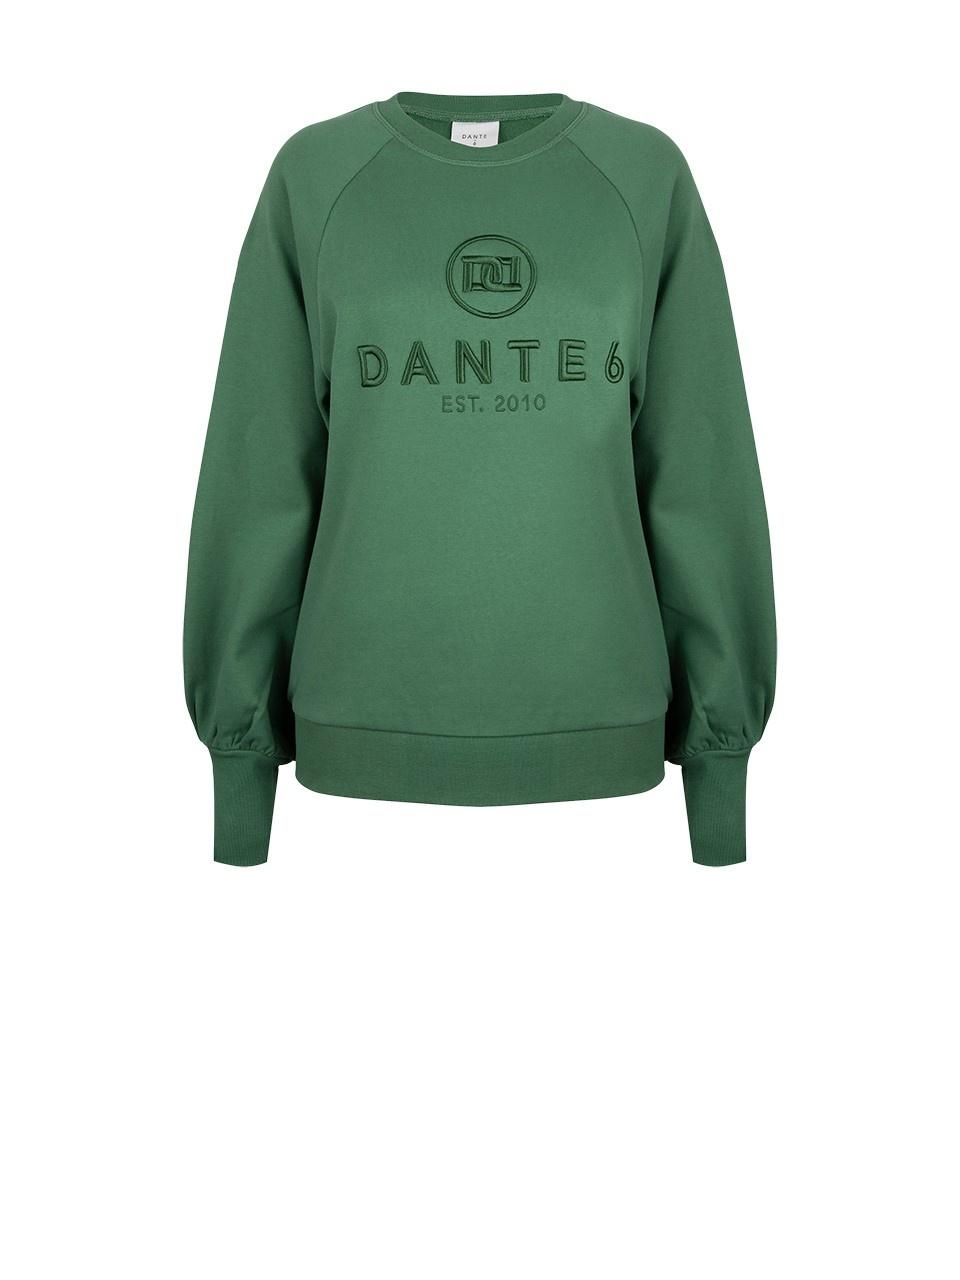 Dante 6 SWEATER 213608 671-1